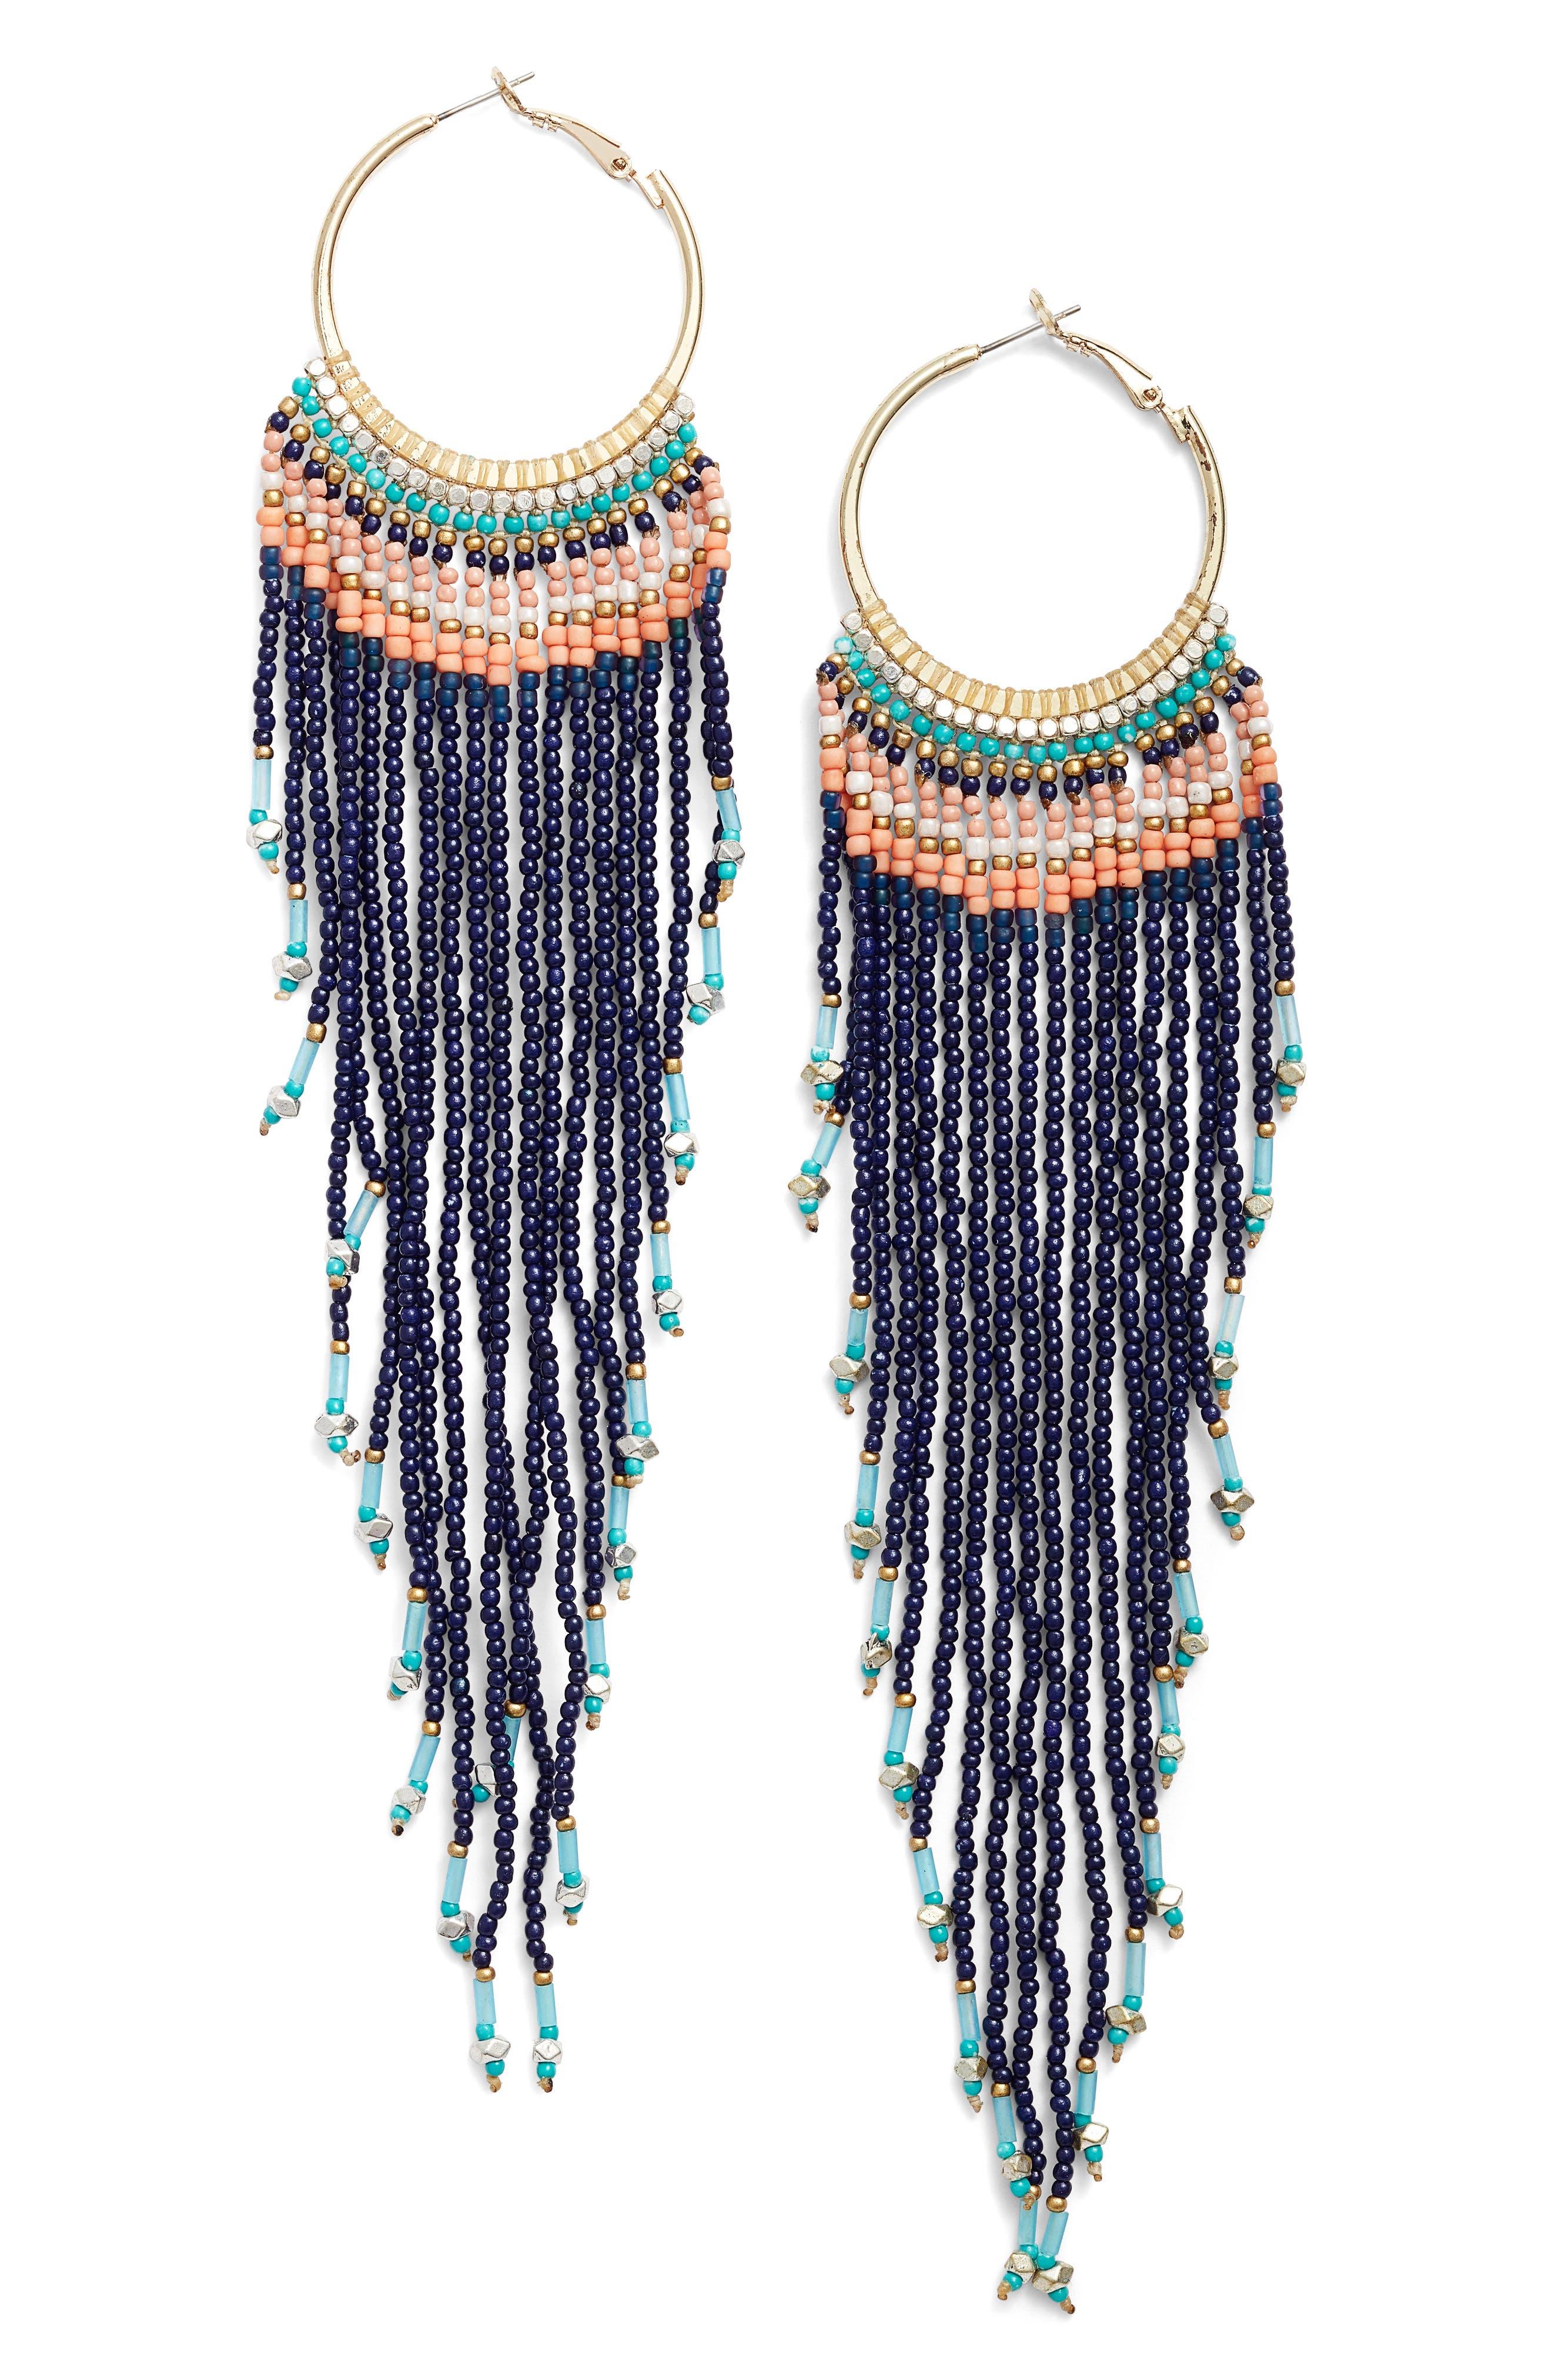 Main Image - Nakamol Design Aban Beaded Tassel Hoop Earrings